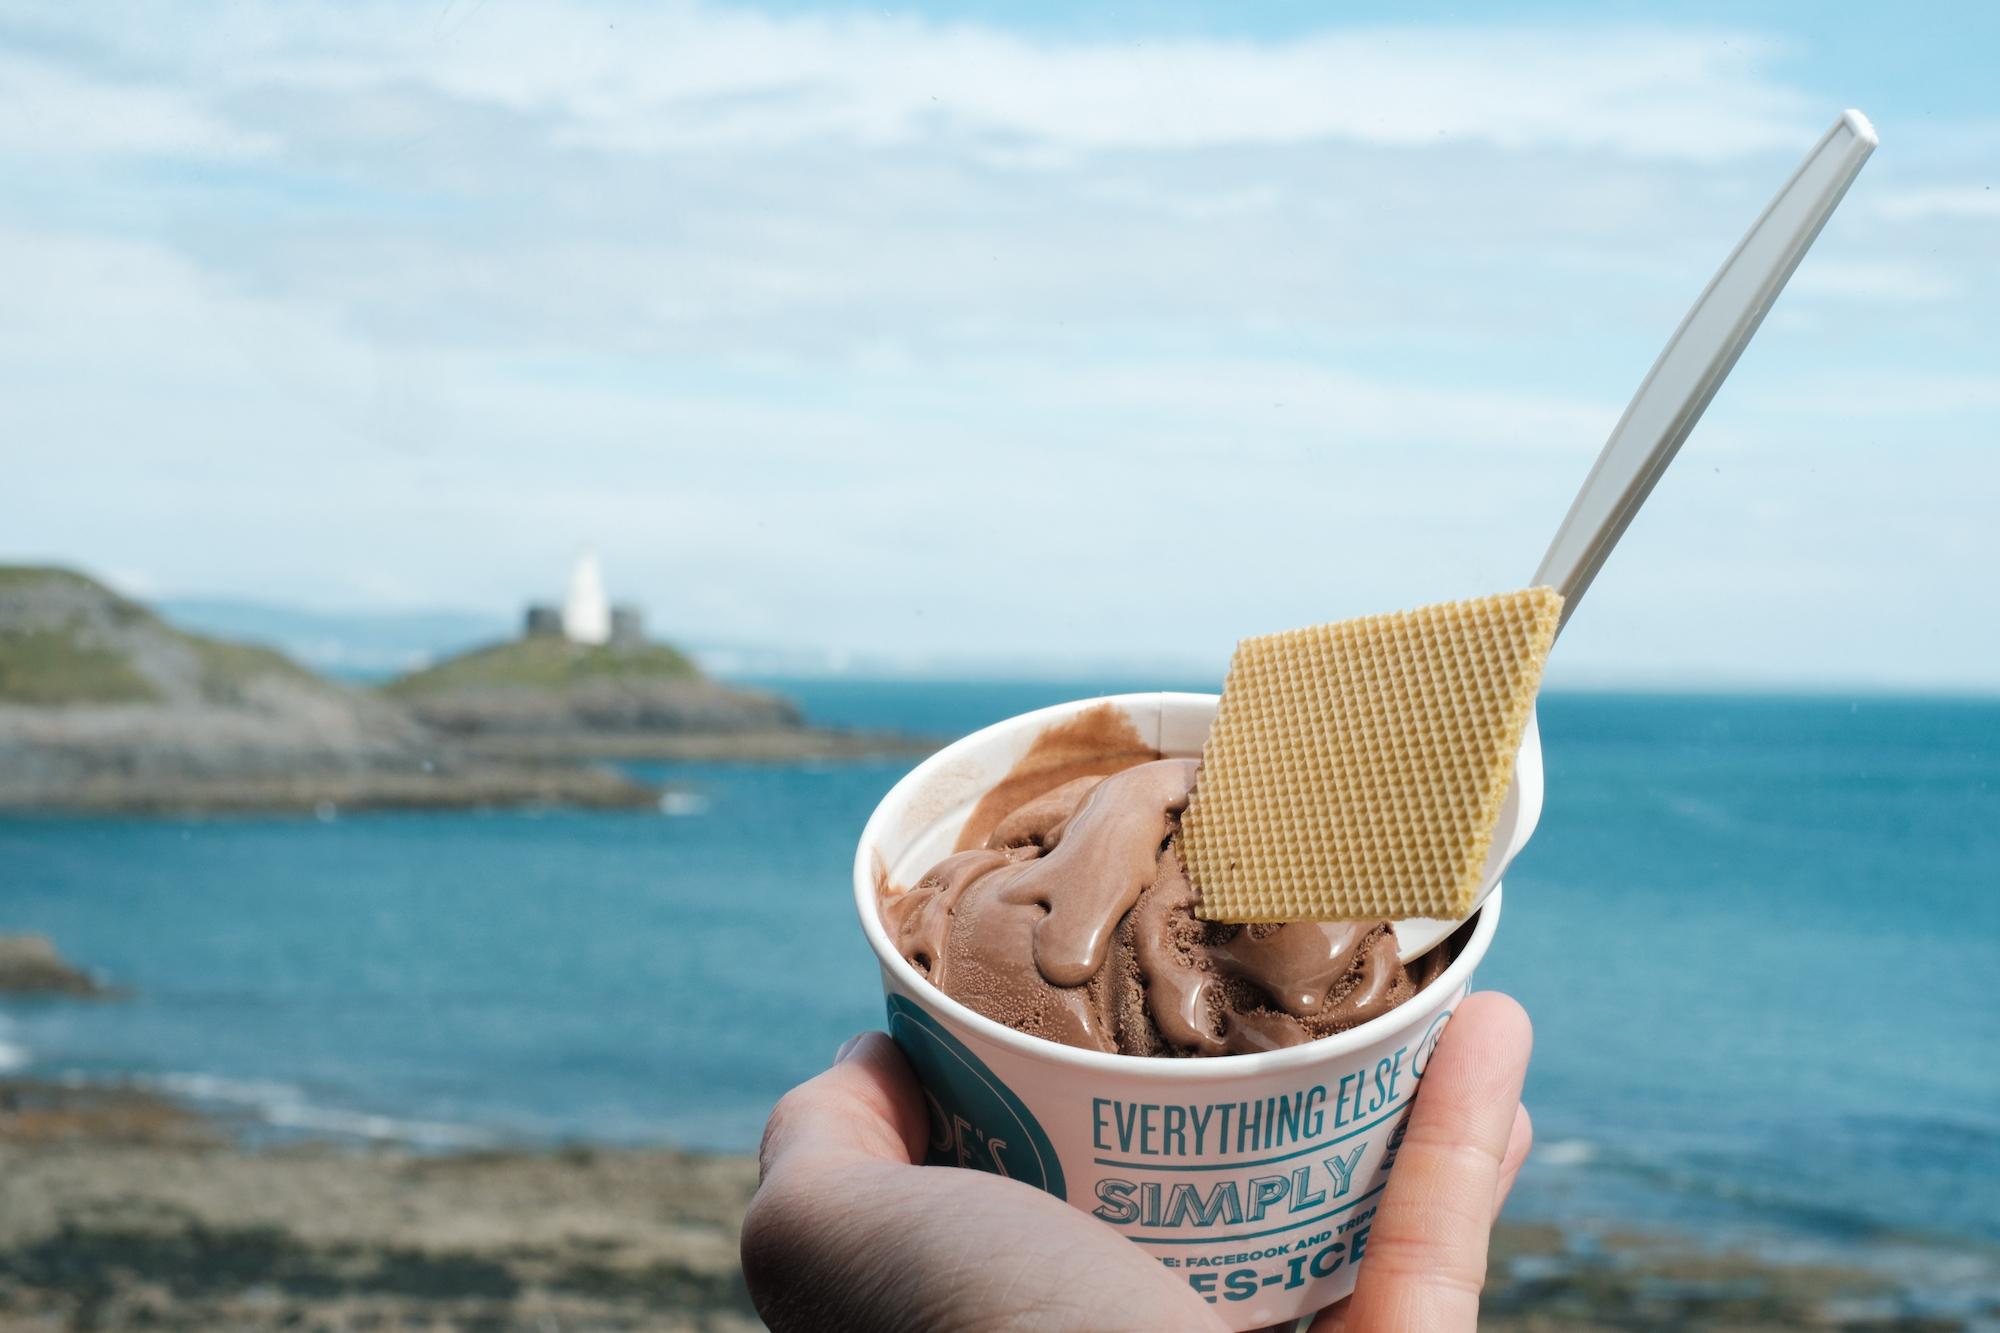 Bracelet Bay with Joe's Ice Cream : Gower Peninsula, Swansea - by Ben Holbrook from DriftwoodJournals.com3